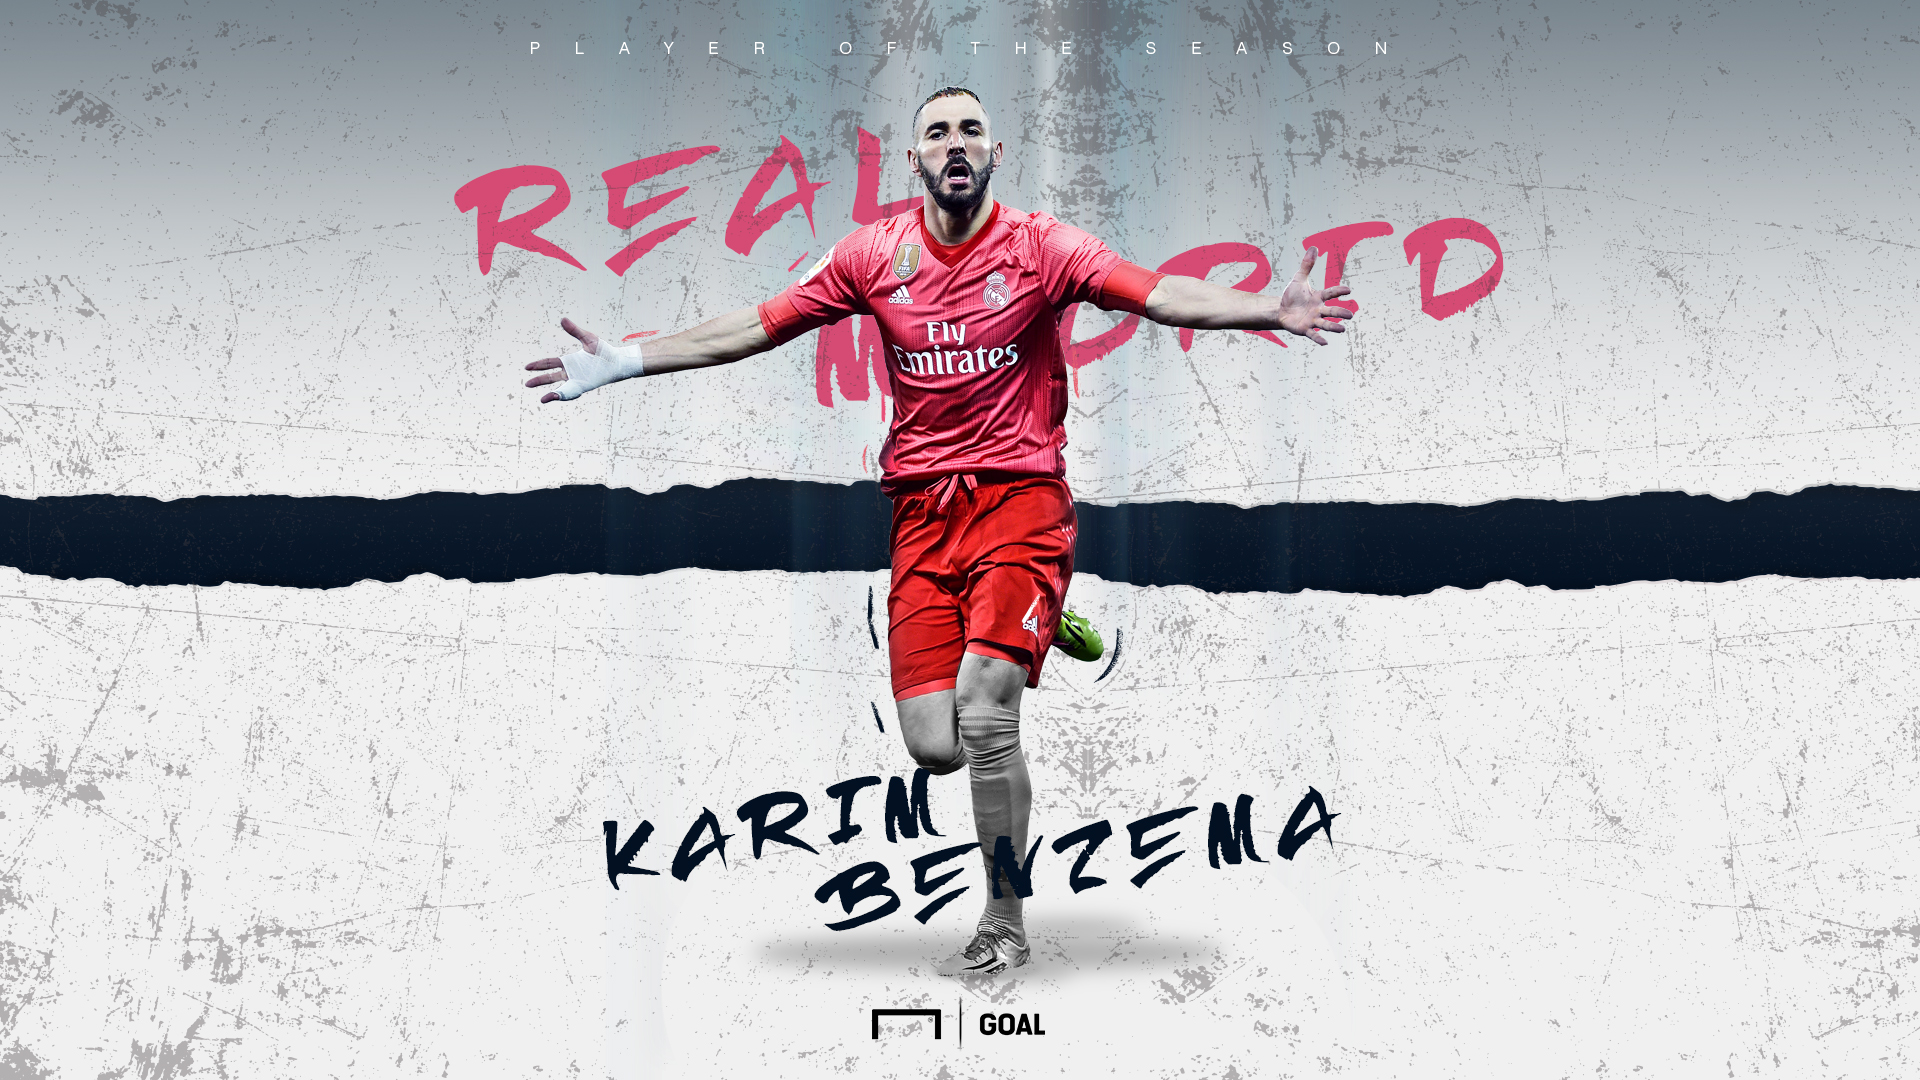 Karim Benzema, Real Madrid Player of the Season, 2018-19